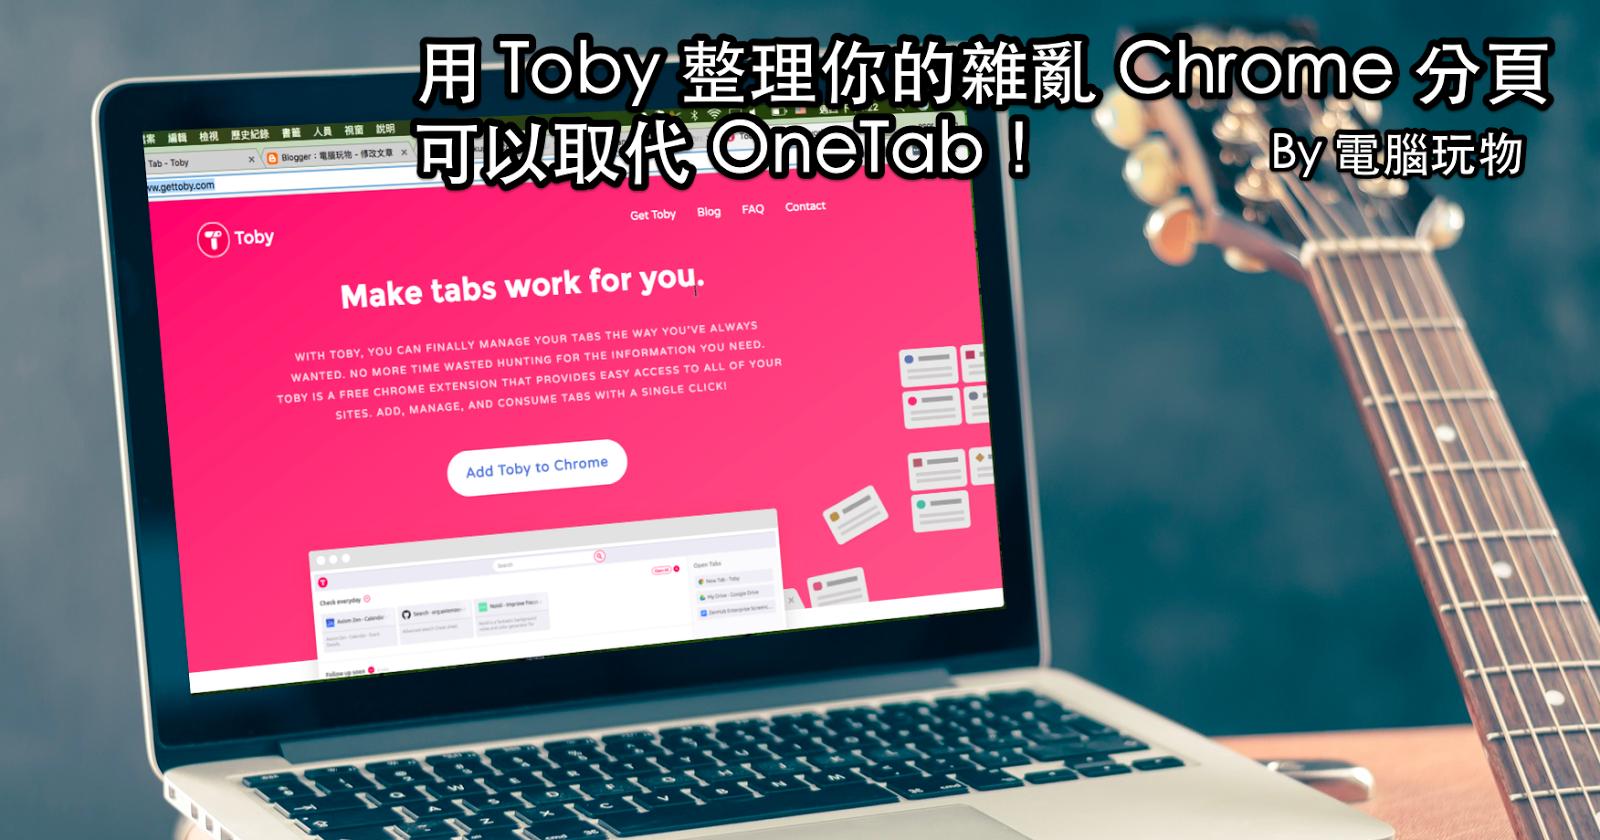 Toby 這是 Chrome 最佳分頁群組套件!好看順暢整理大量分頁